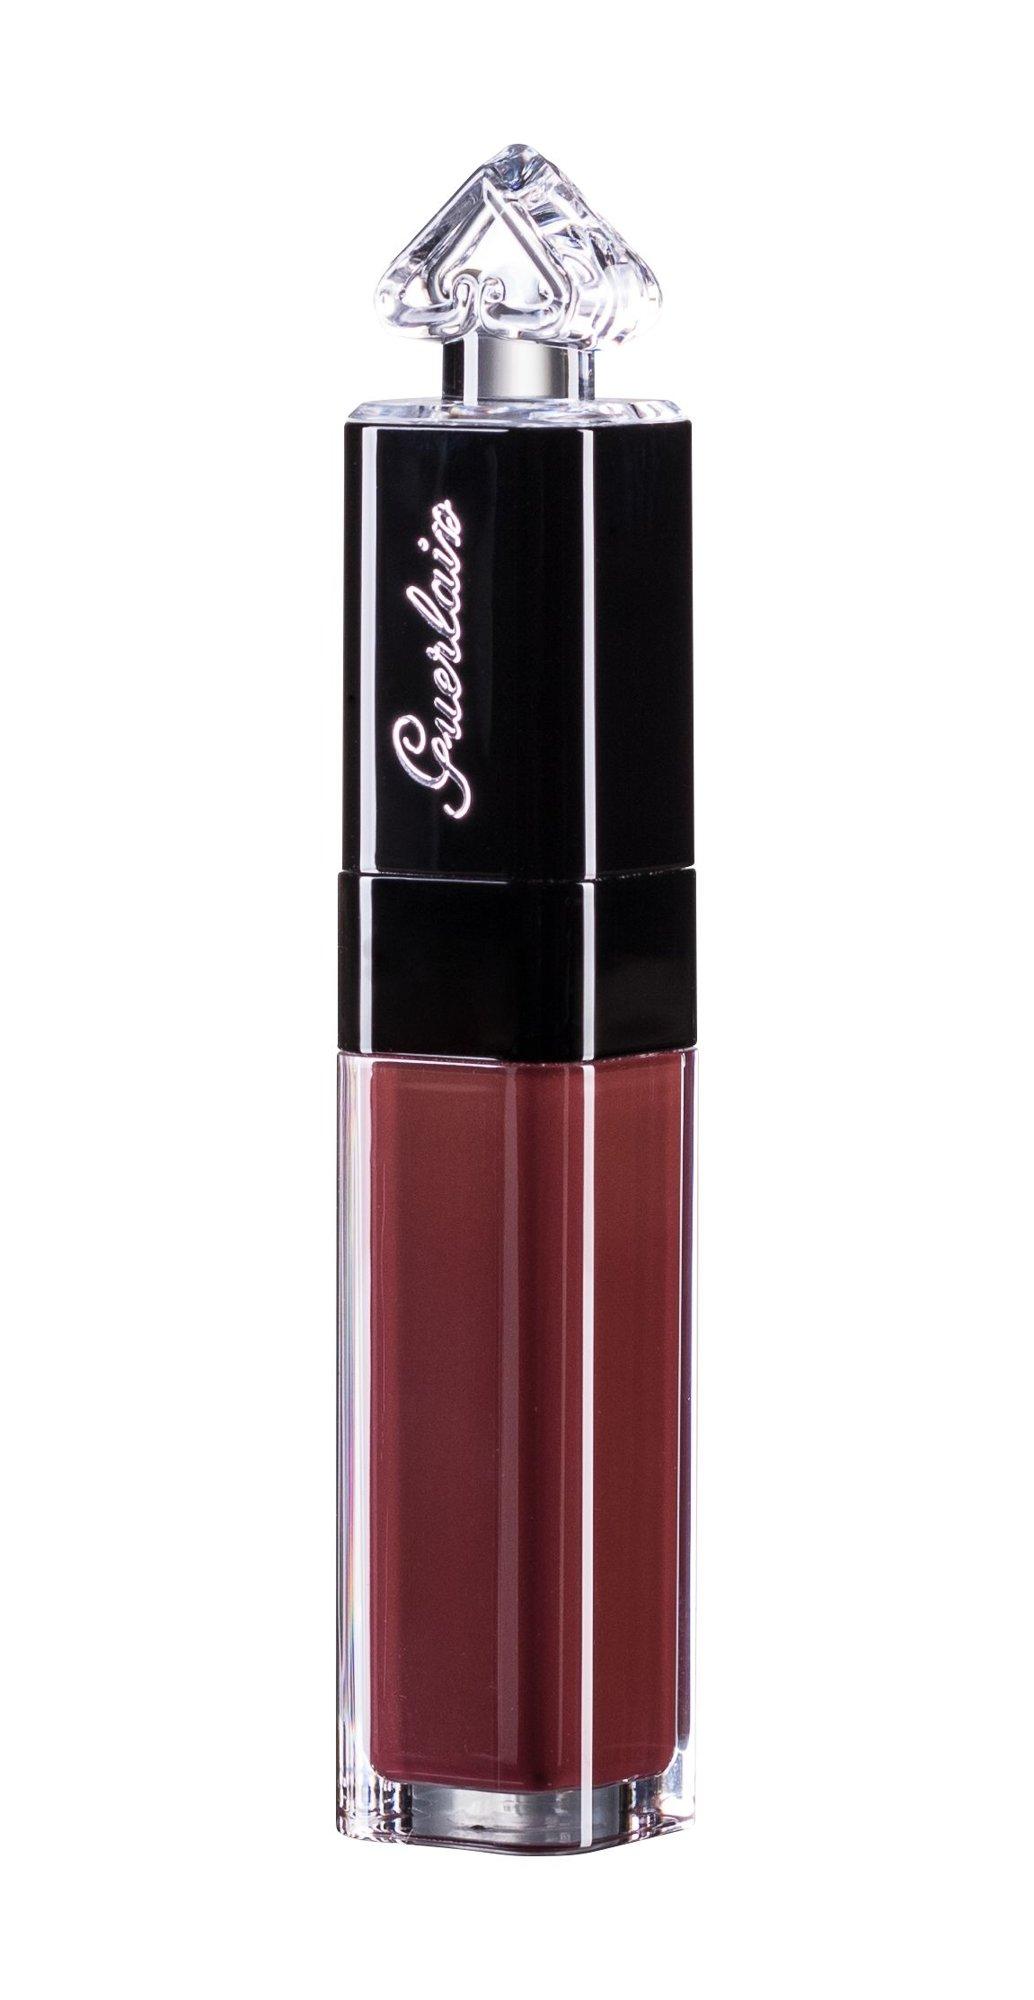 Guerlain La Petite Robe Noire Lipstick 6ml L122#Dark Sided